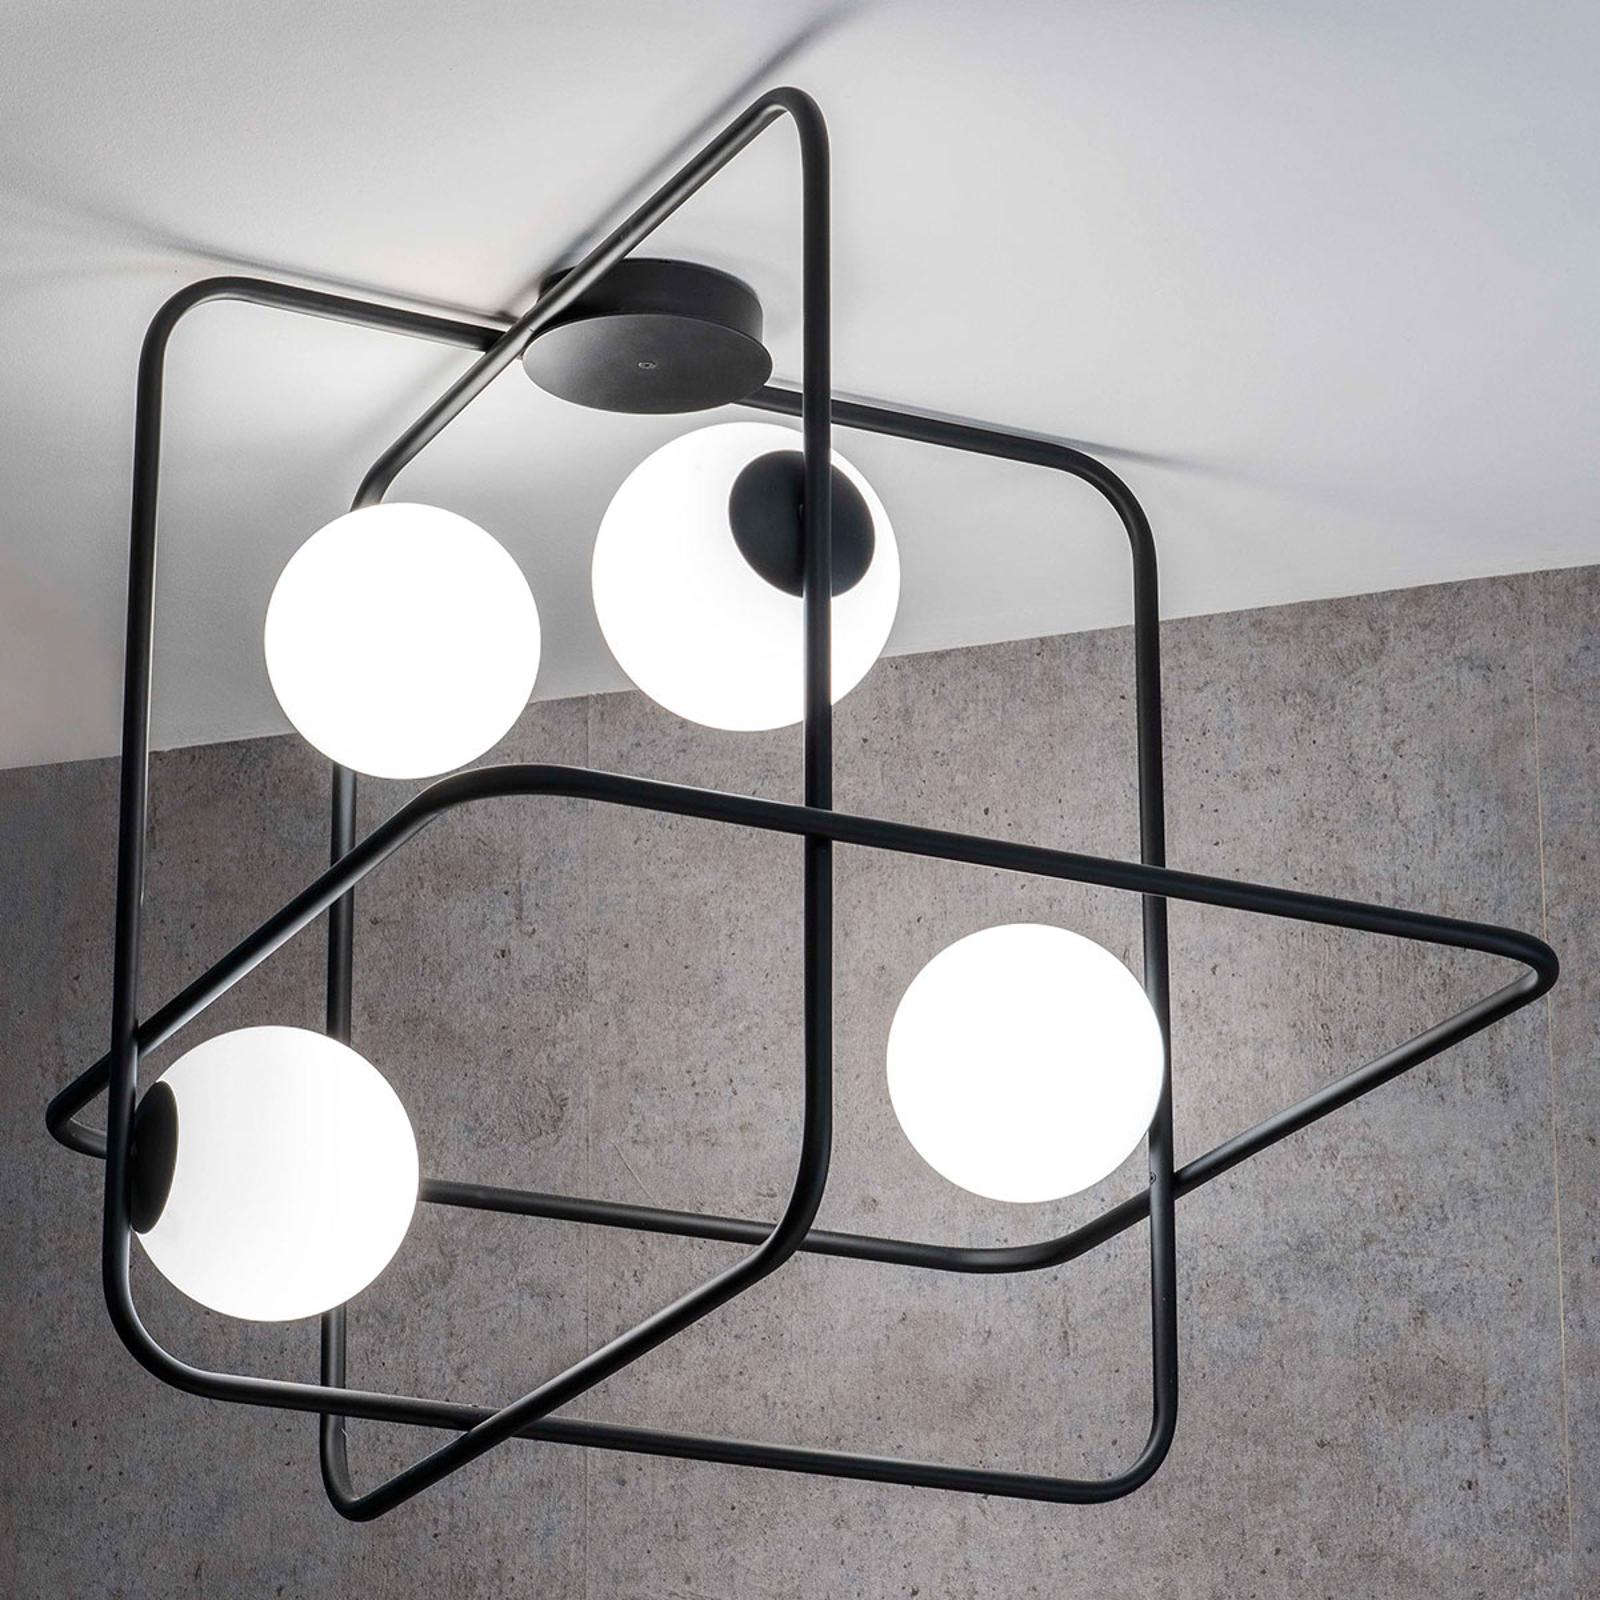 Lampa sufitowa Intrigo kwadratowa czarna